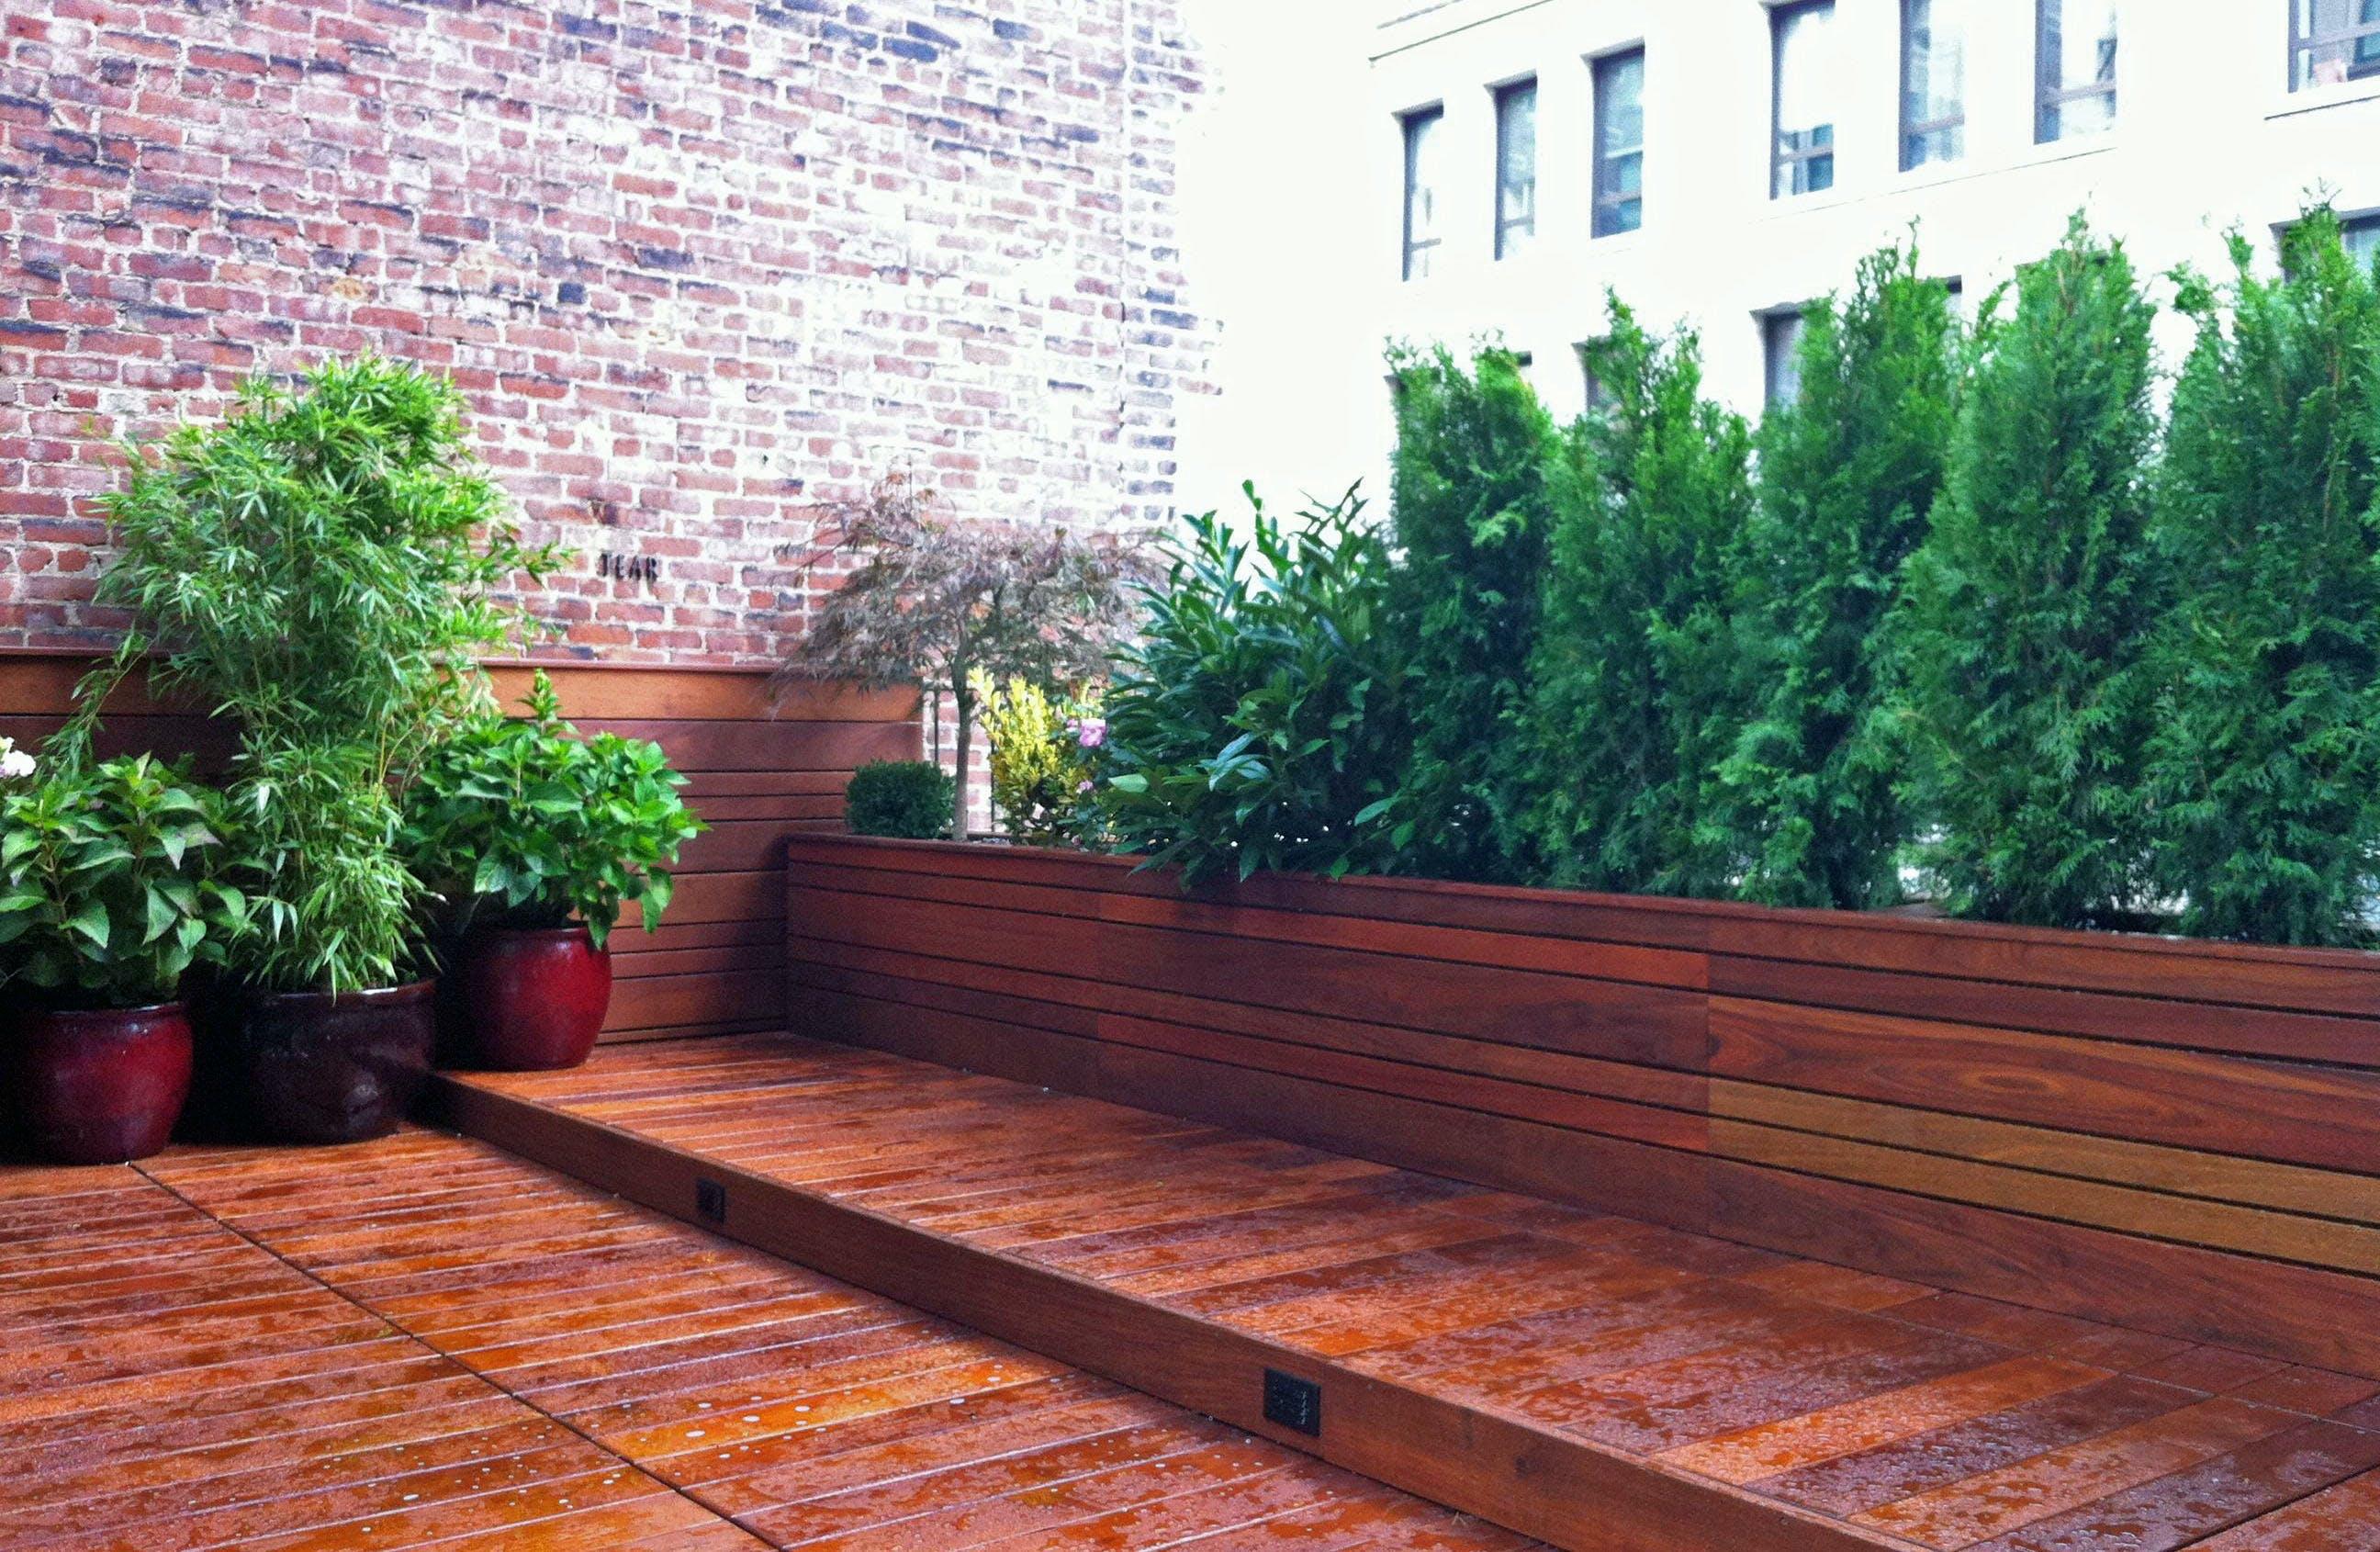 Nyc Landscape Design Gramercy Park Rooftop Terrace Garden Amber Freda Nyc Home Garden